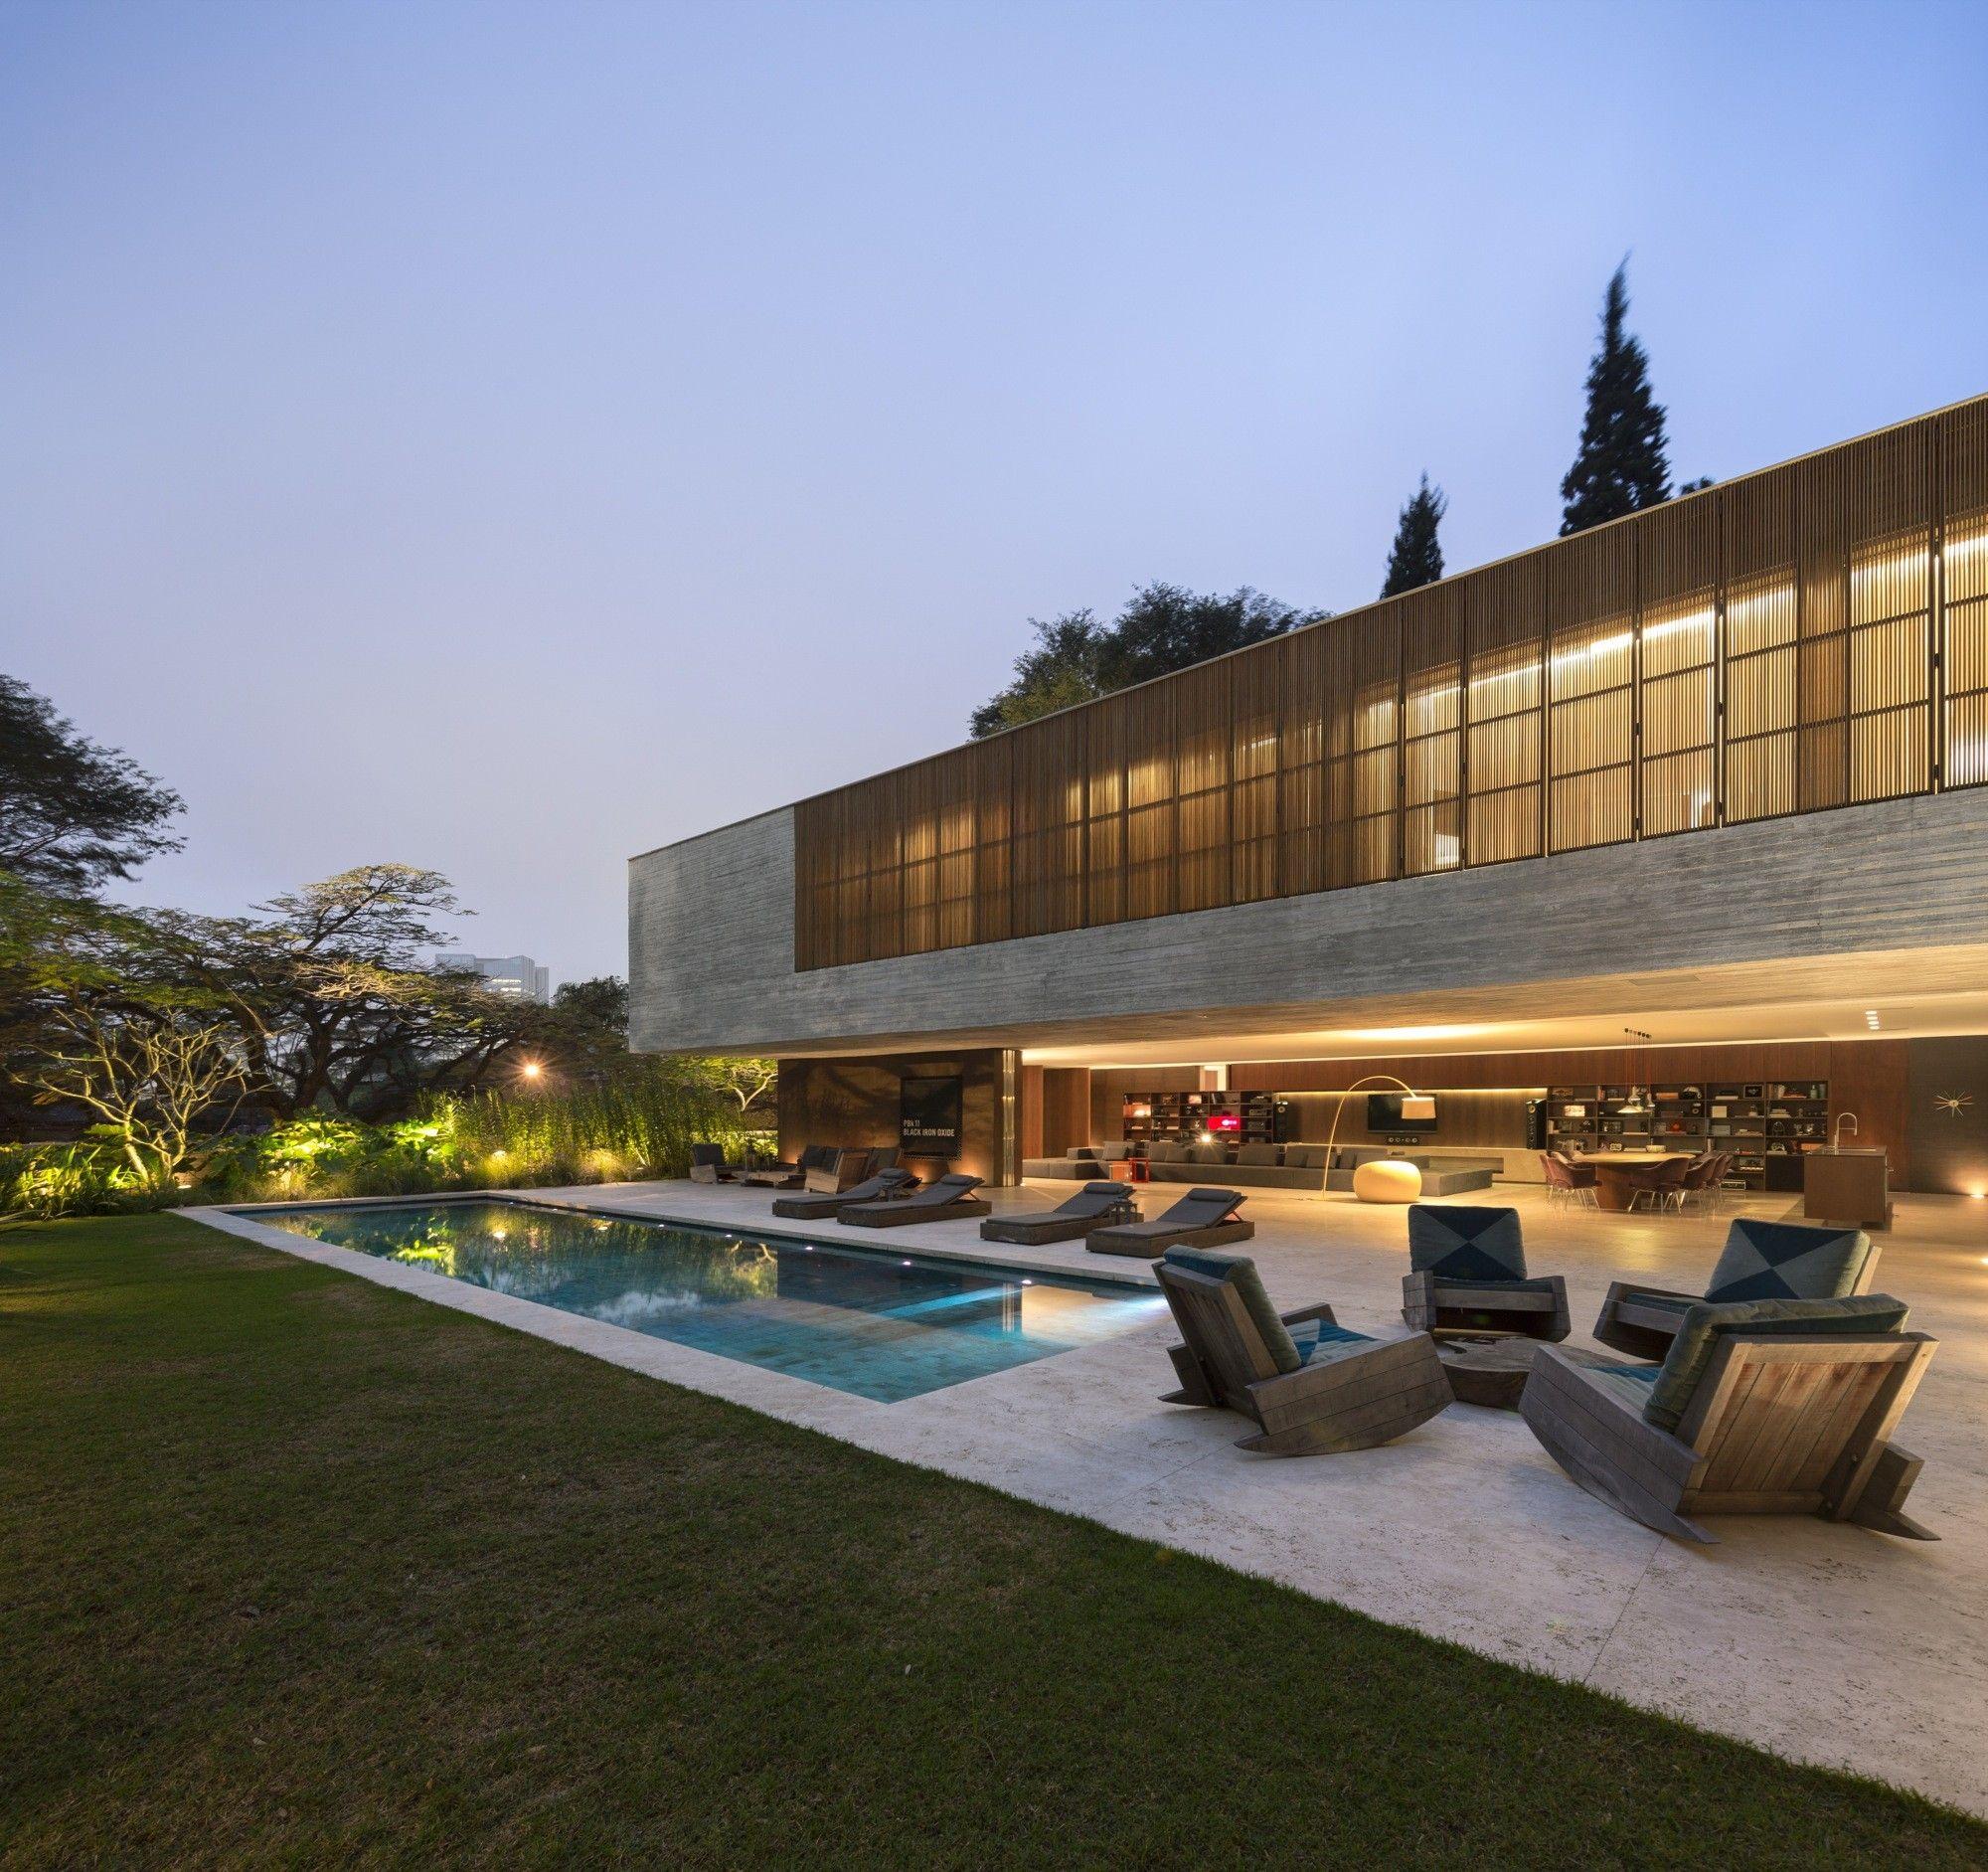 Open layout house concept by studio mk27 - Gallery Of Ipes House Studio Mk27 Marcio Kogan Lair Reis 9